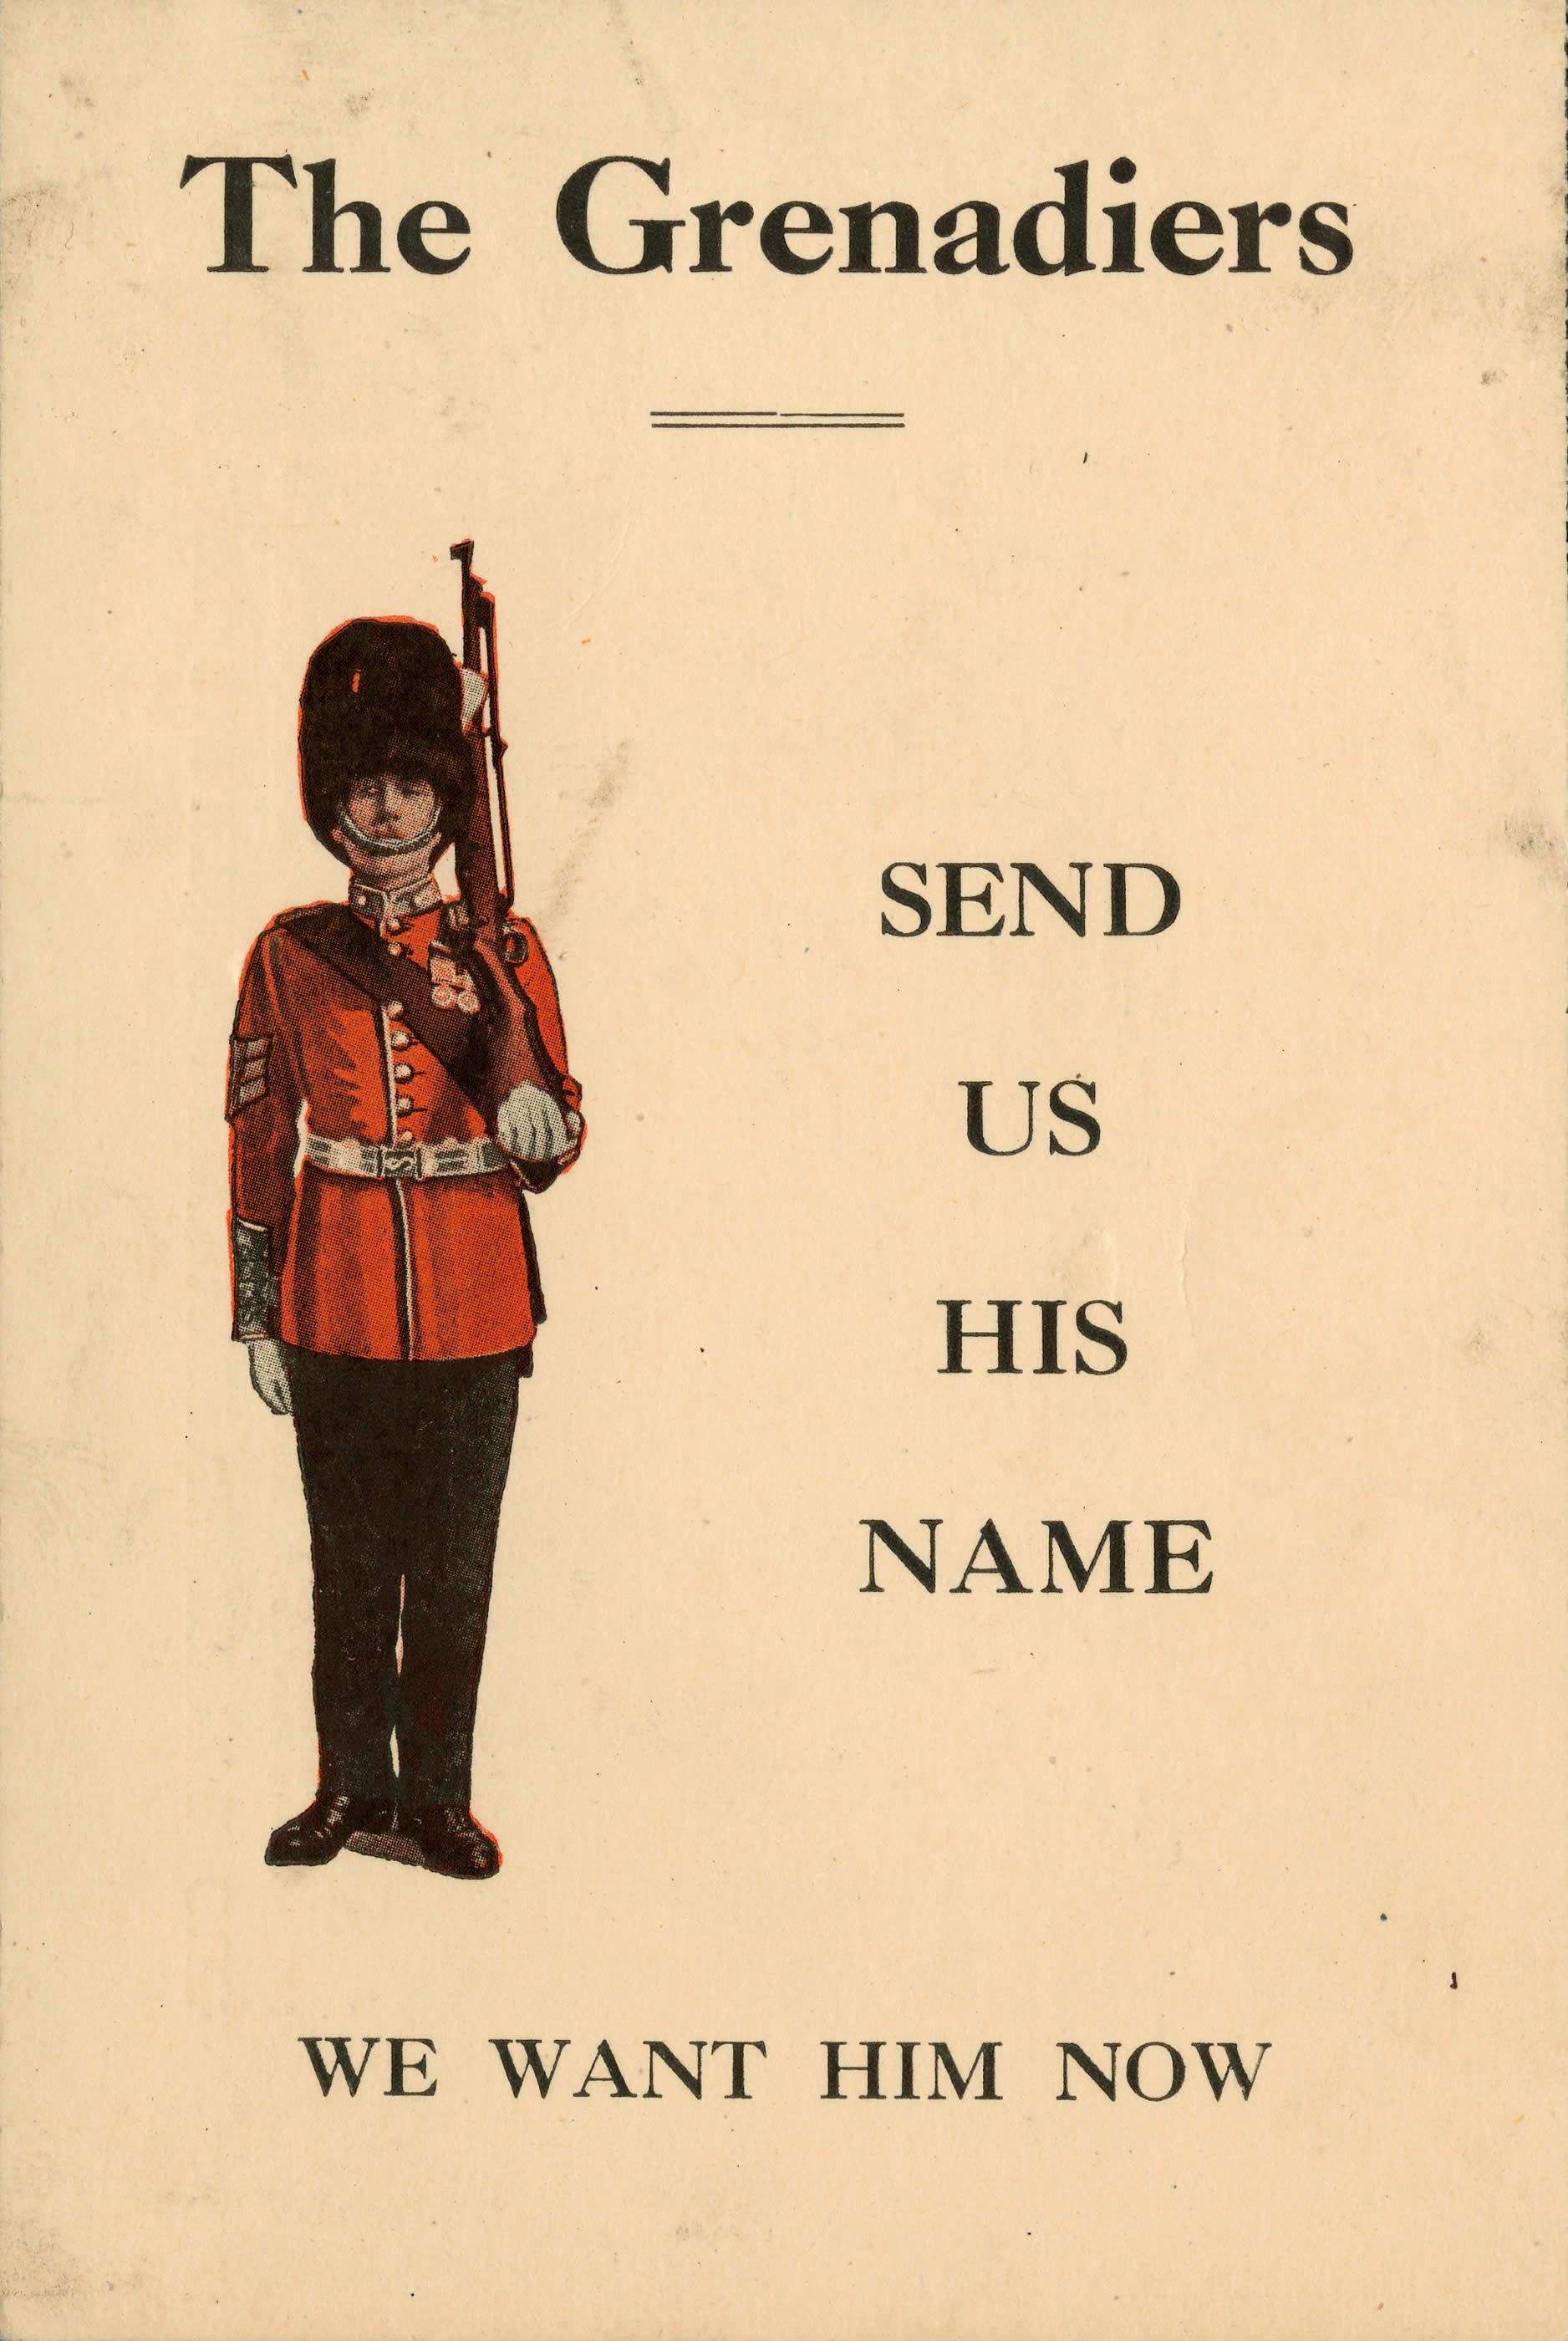 <i>Send Us His Name</i>